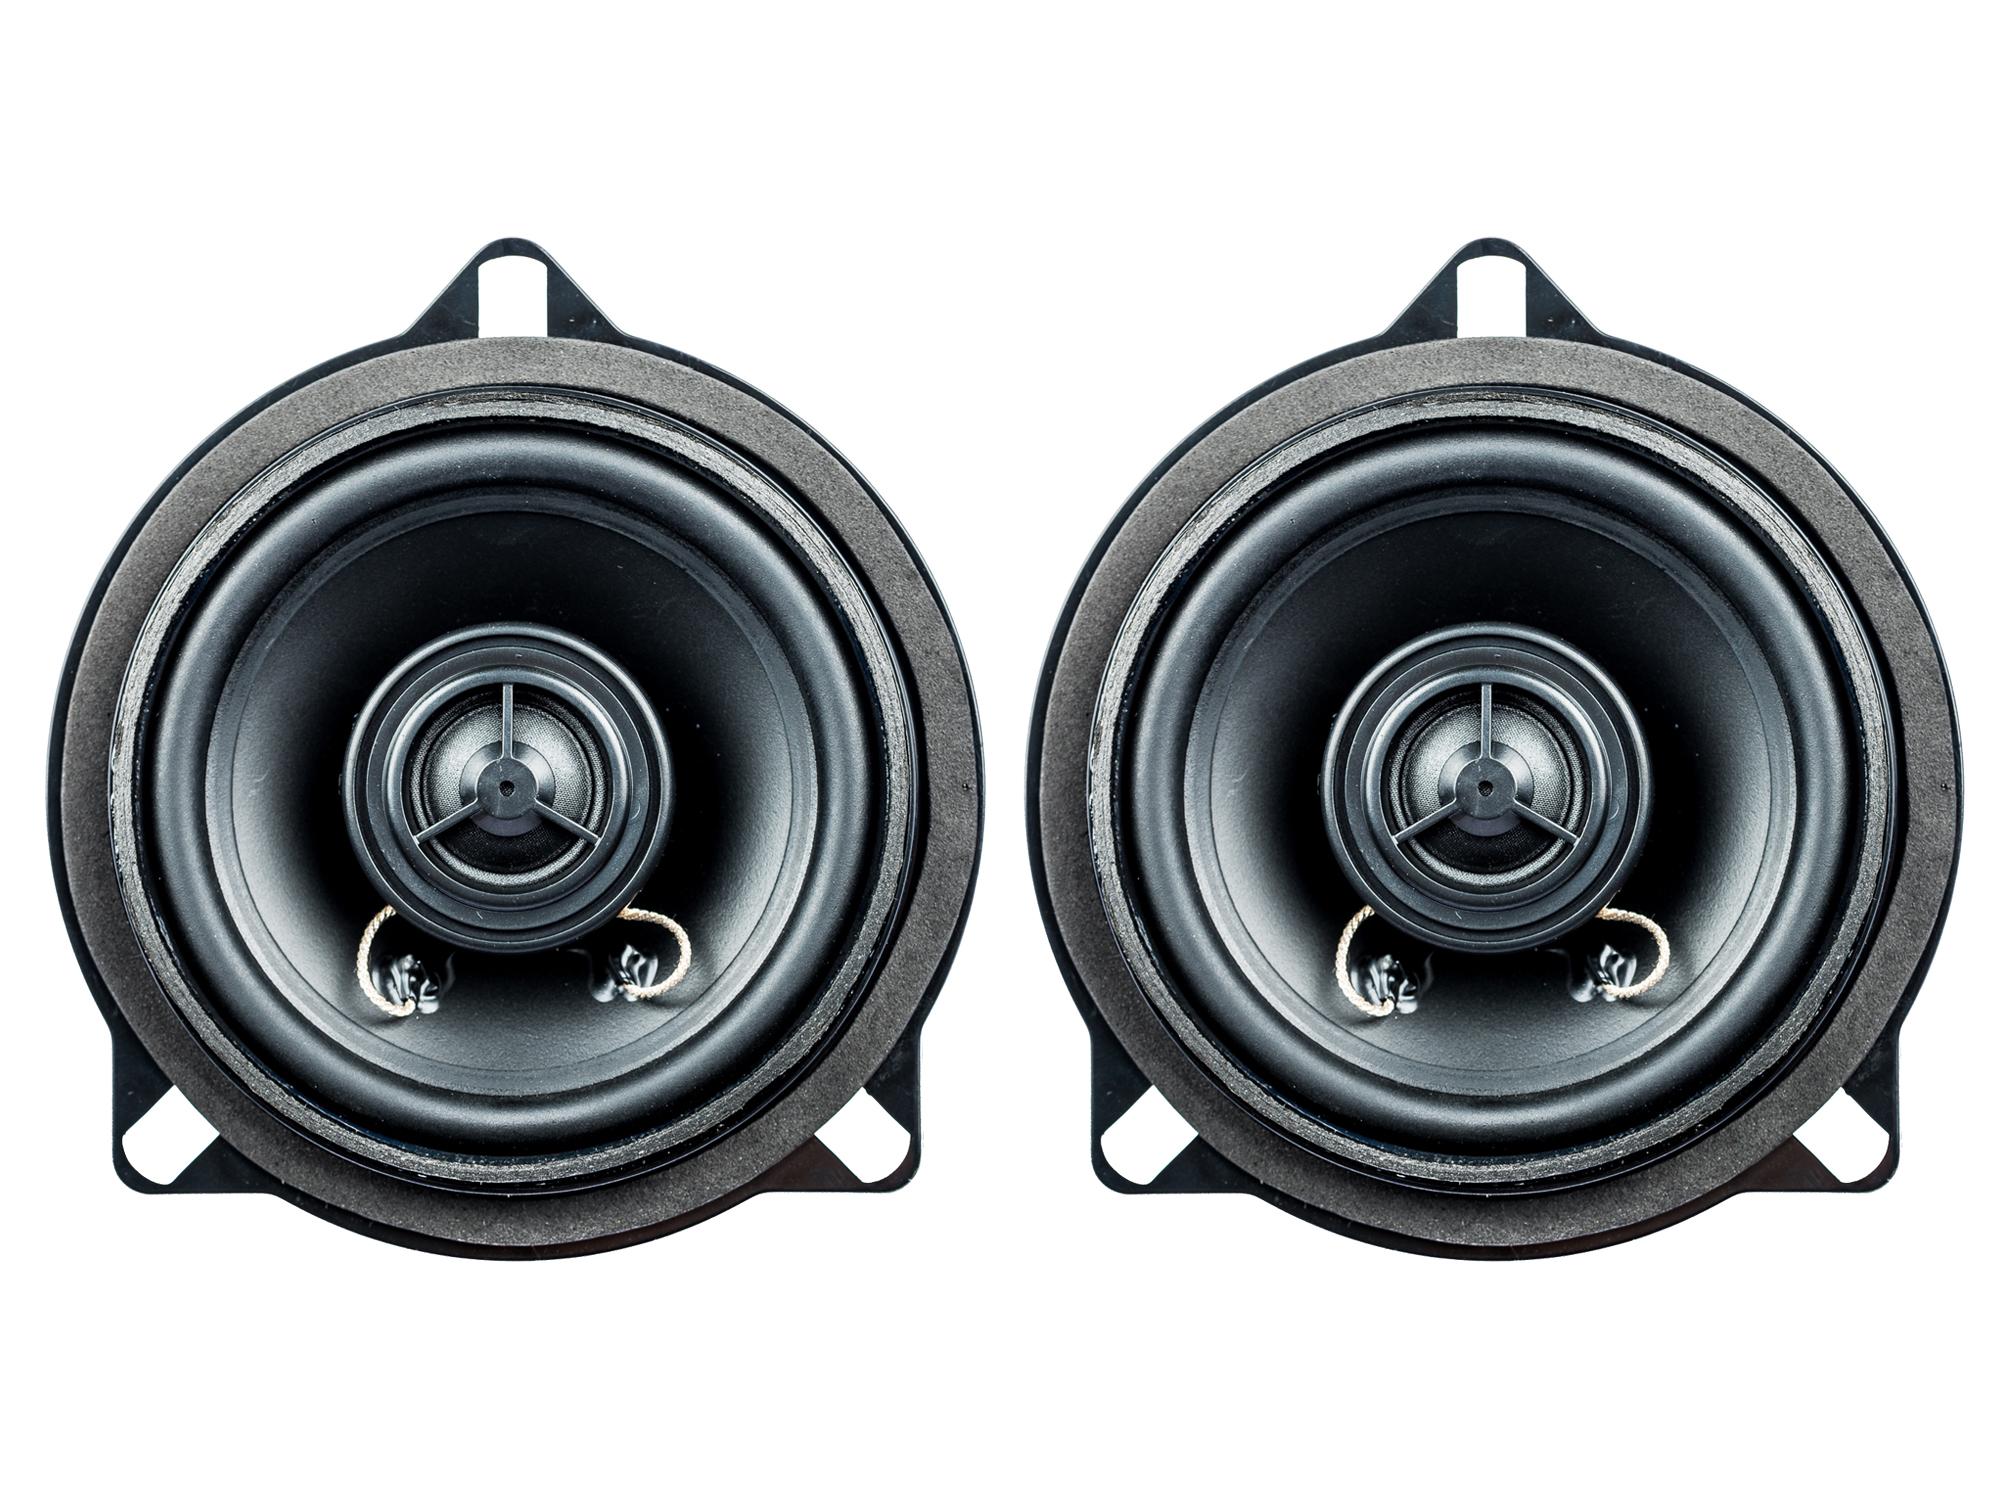 PG Audio BM-4, 10 cm Koaxial Lautsprecher passend für BMW 1er (E81, E82, E87, E88), 3er (E90, E91, E92) 5er (E60, E61), X1 (E84)1 Paar